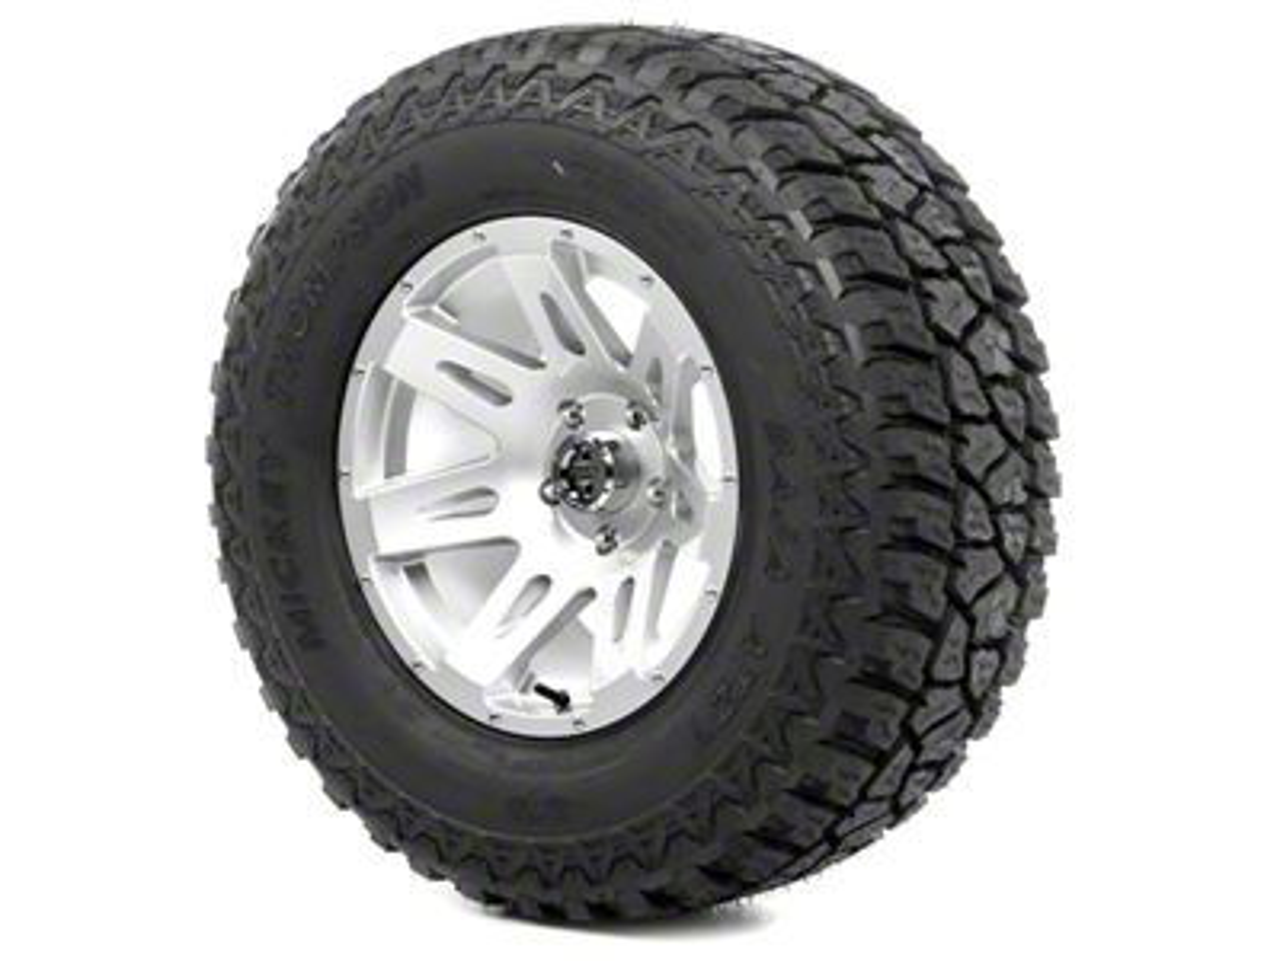 Rugged Ridge XHD Wheel 17x9 Silver and Mickey Thompson ATZ P3 305/65R17 Tire Kit (13-18 Jeep Wrangler JK; 2018 Jeep Wrangler JL)